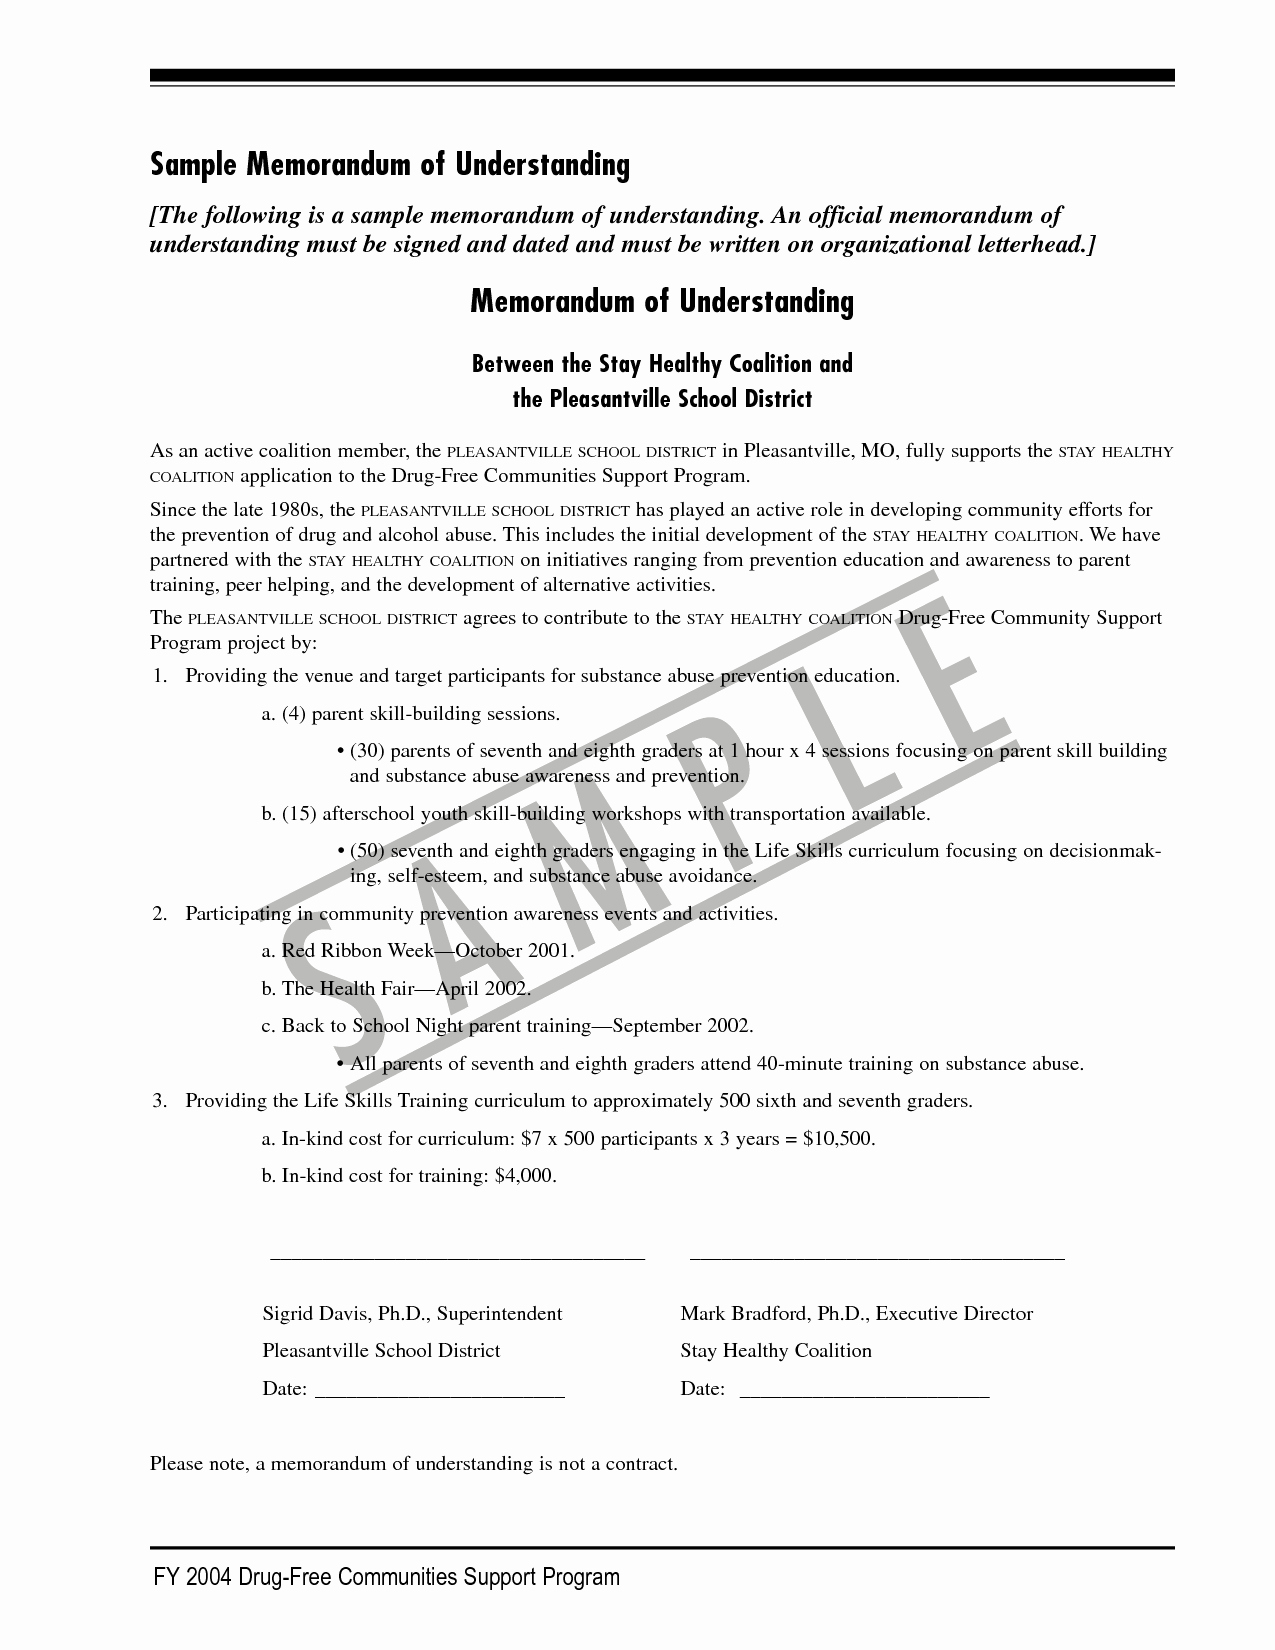 Memorandum Of Understanding Template Awesome 10 Best Of Example Memorandum Understanding